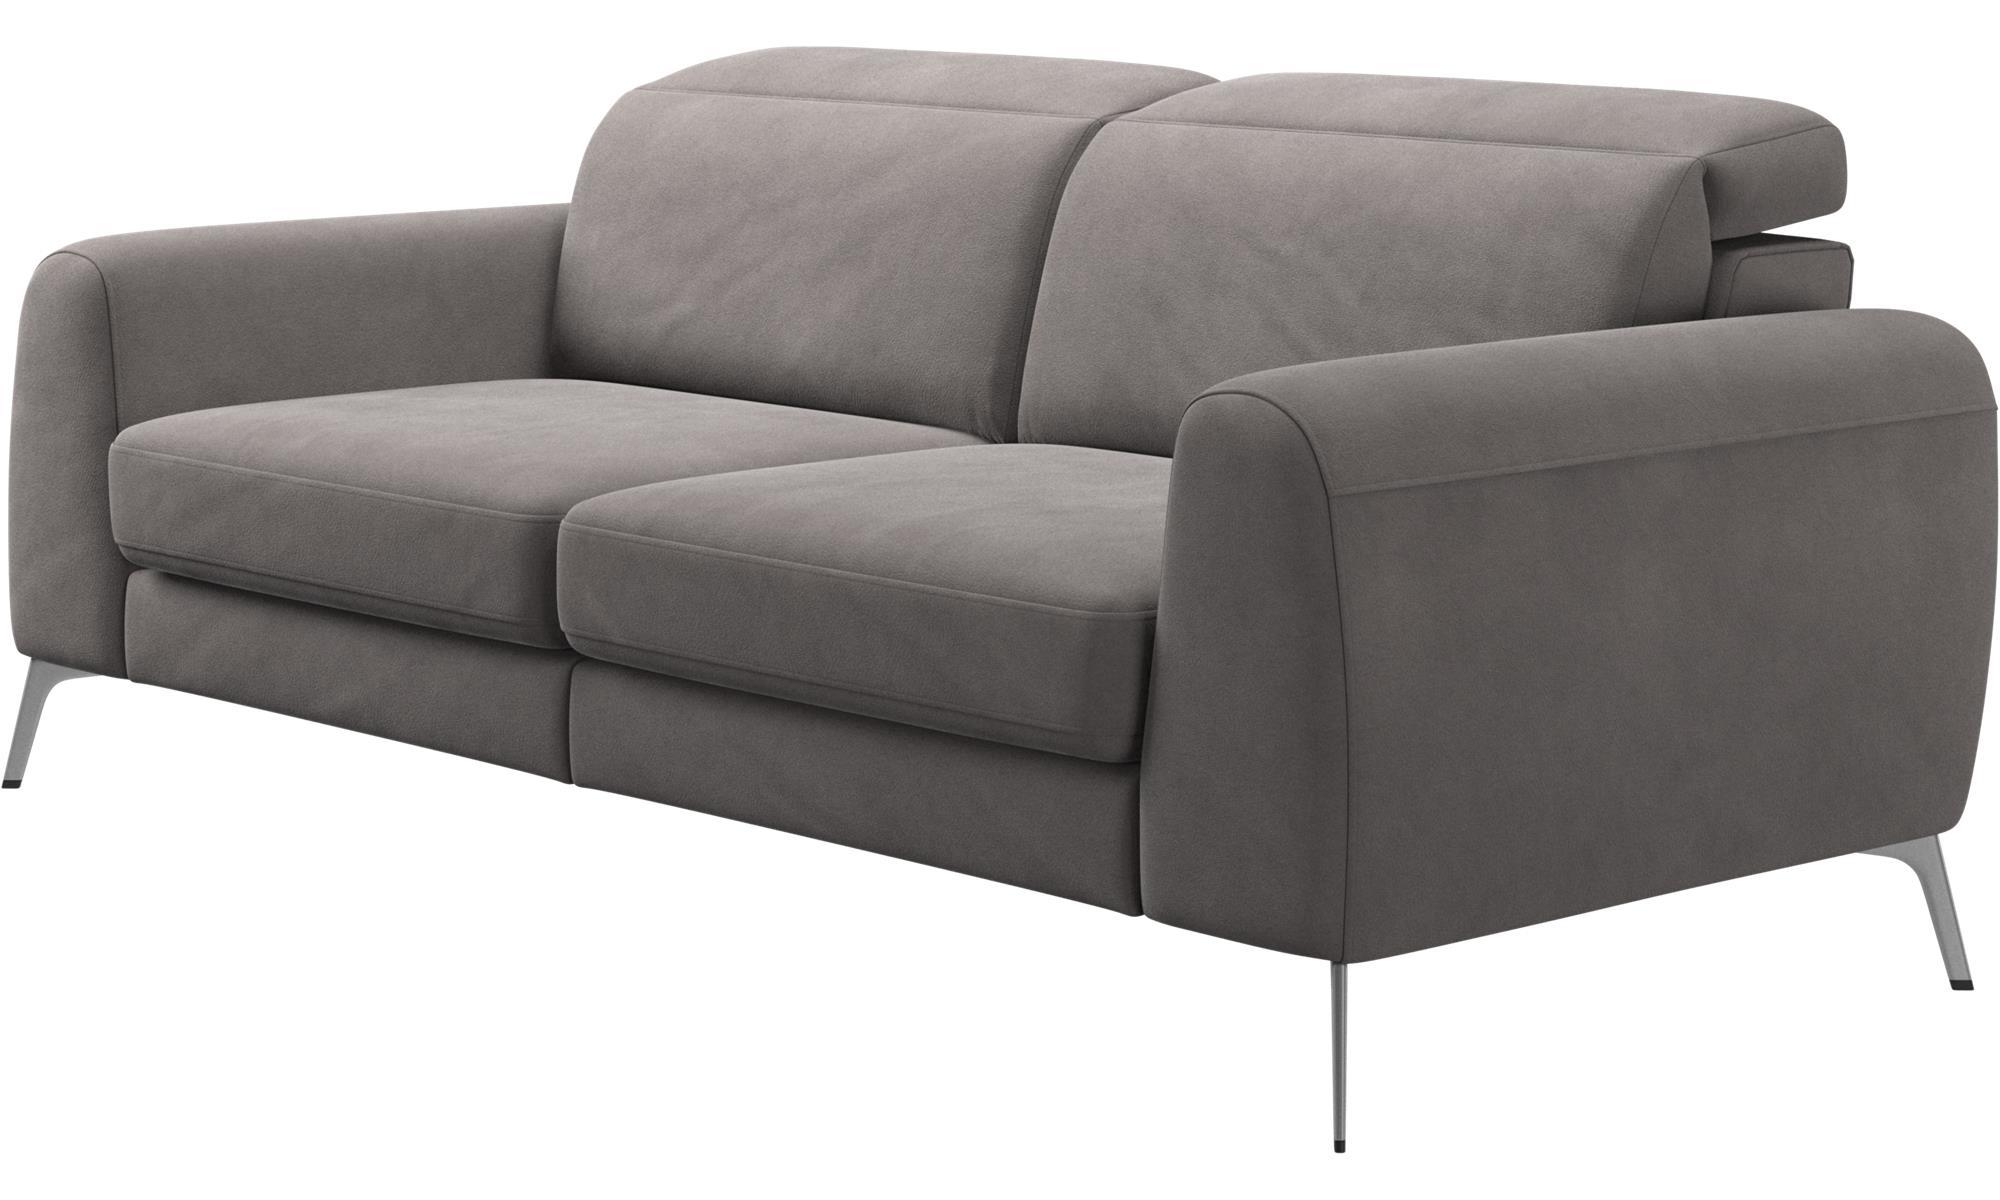 bed beds niklas sofabed sofa